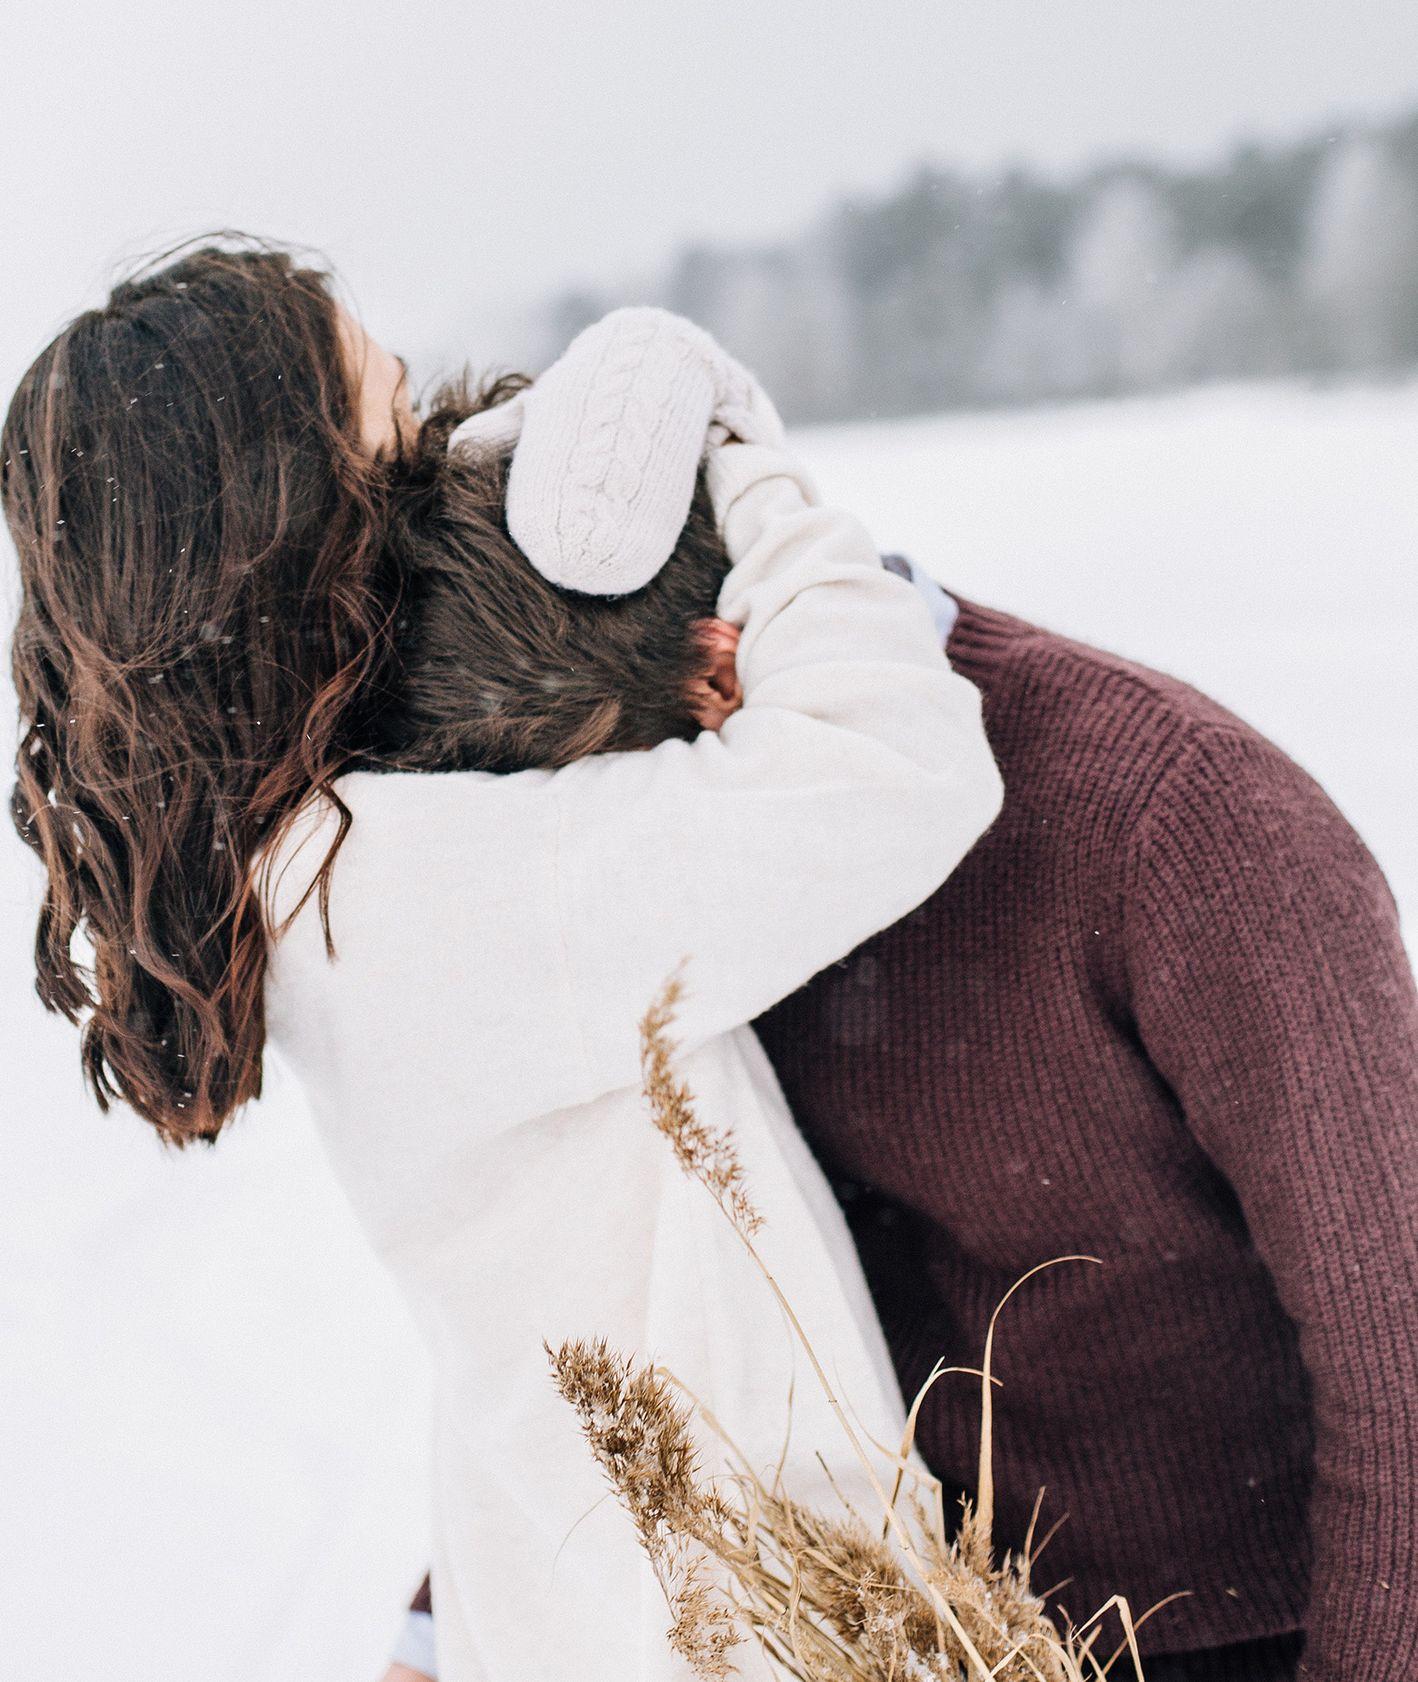 Zakochana para w zimowym krajobrazie (fot. Daria Shevtsova / pexels.com)